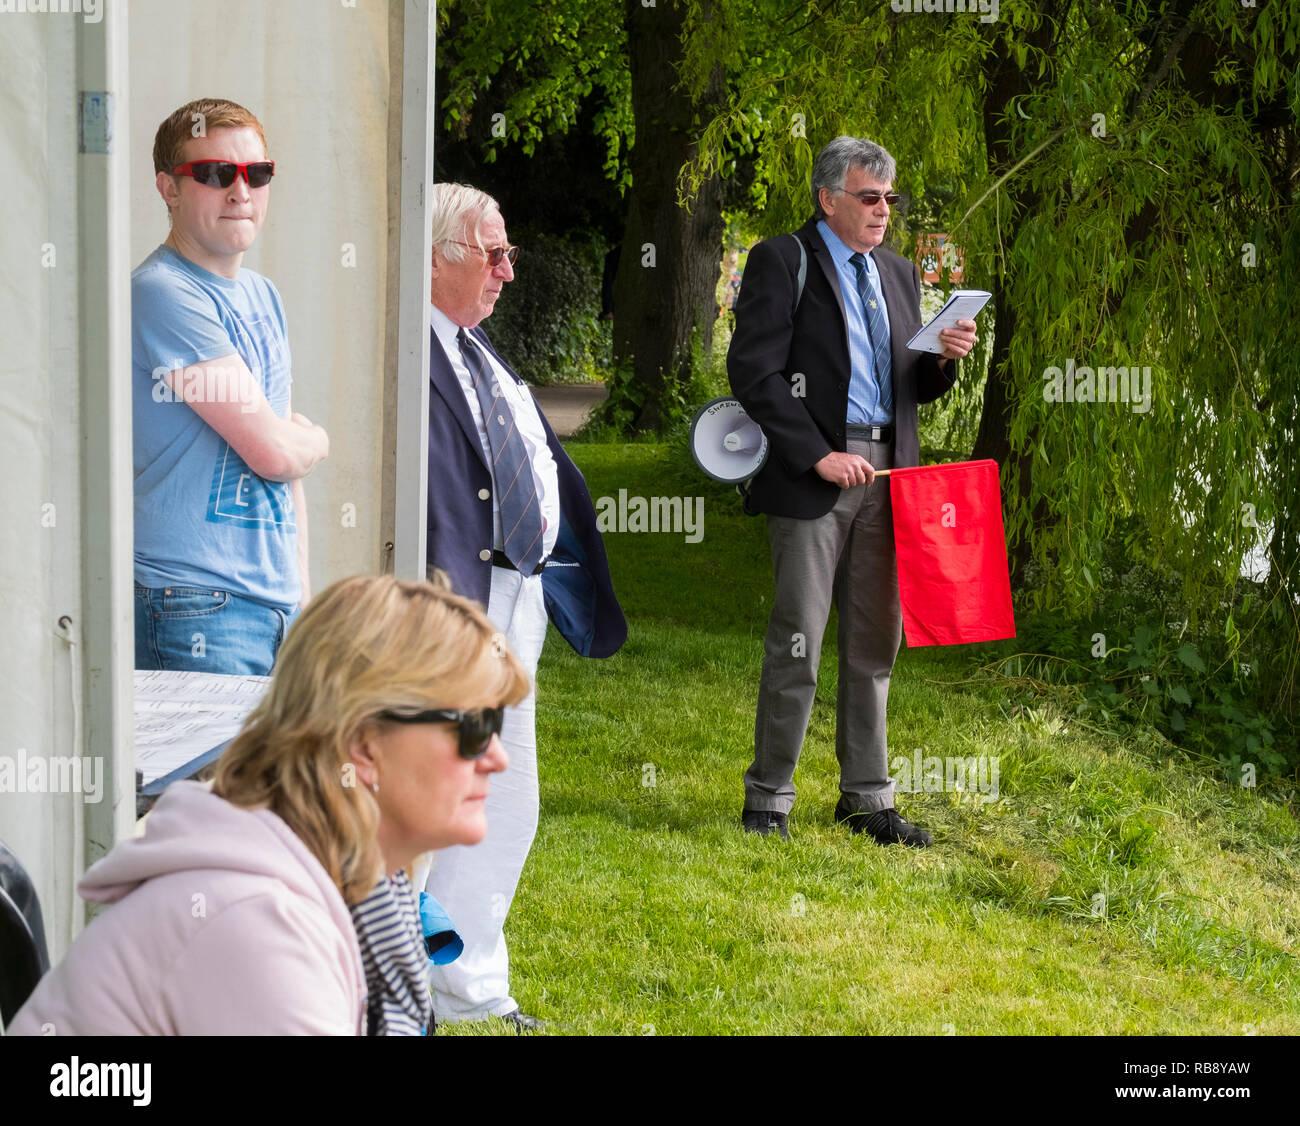 Officials and starter at Shrewsbury Regatta, Shropshire, England, UK - Stock Image